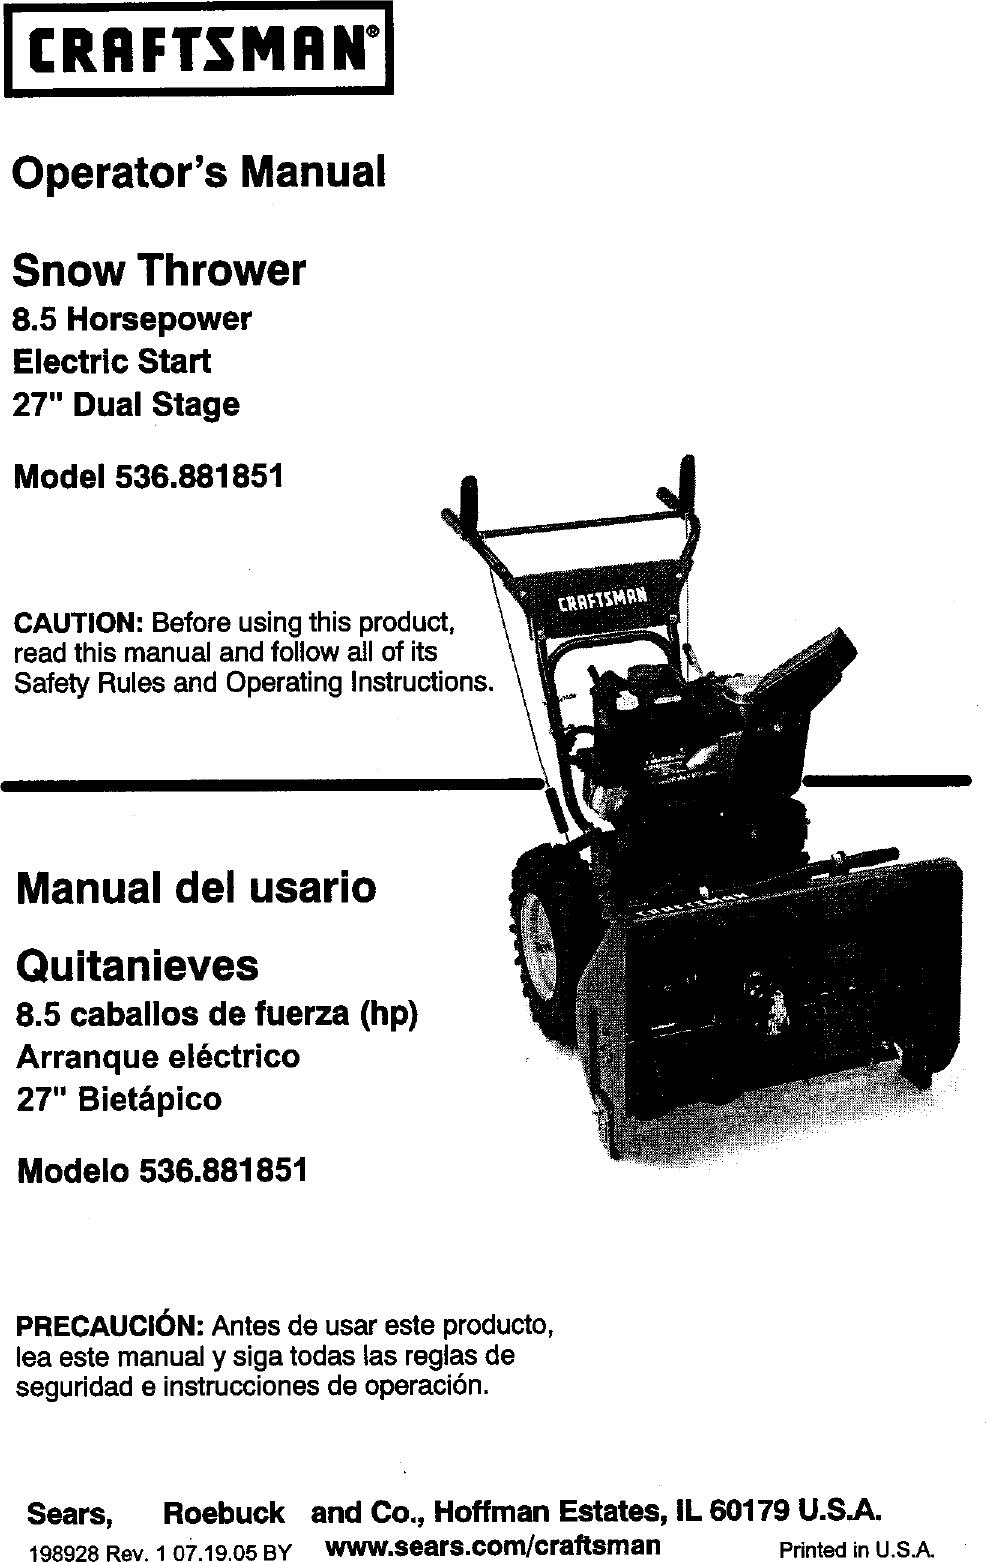 Craftsman 536881851 Users Manual